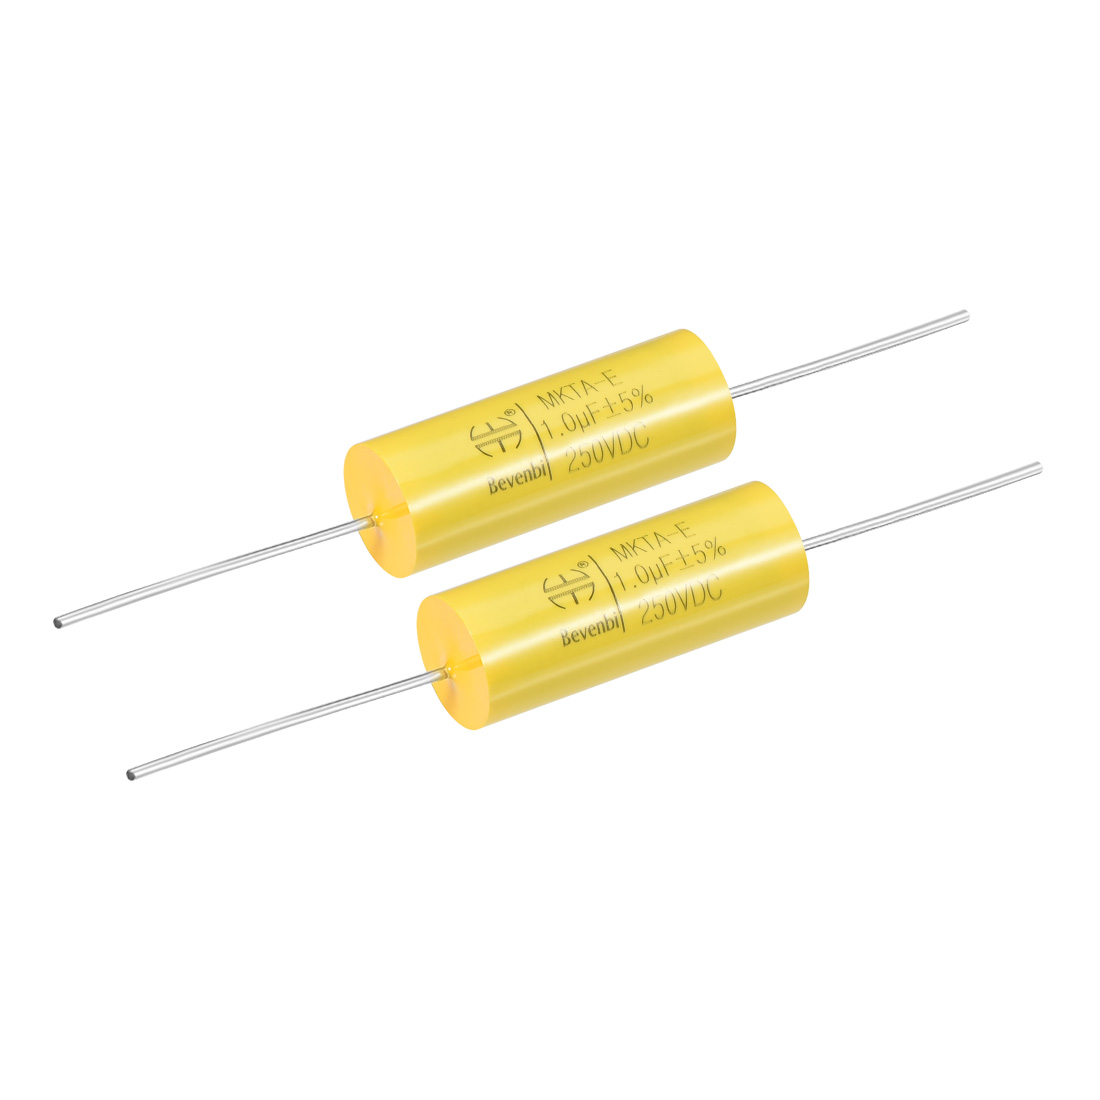 Film Capacitor 250V DC 1.0uF MKTA-E Round Polypropylene Capacitors Yellow 2pcs